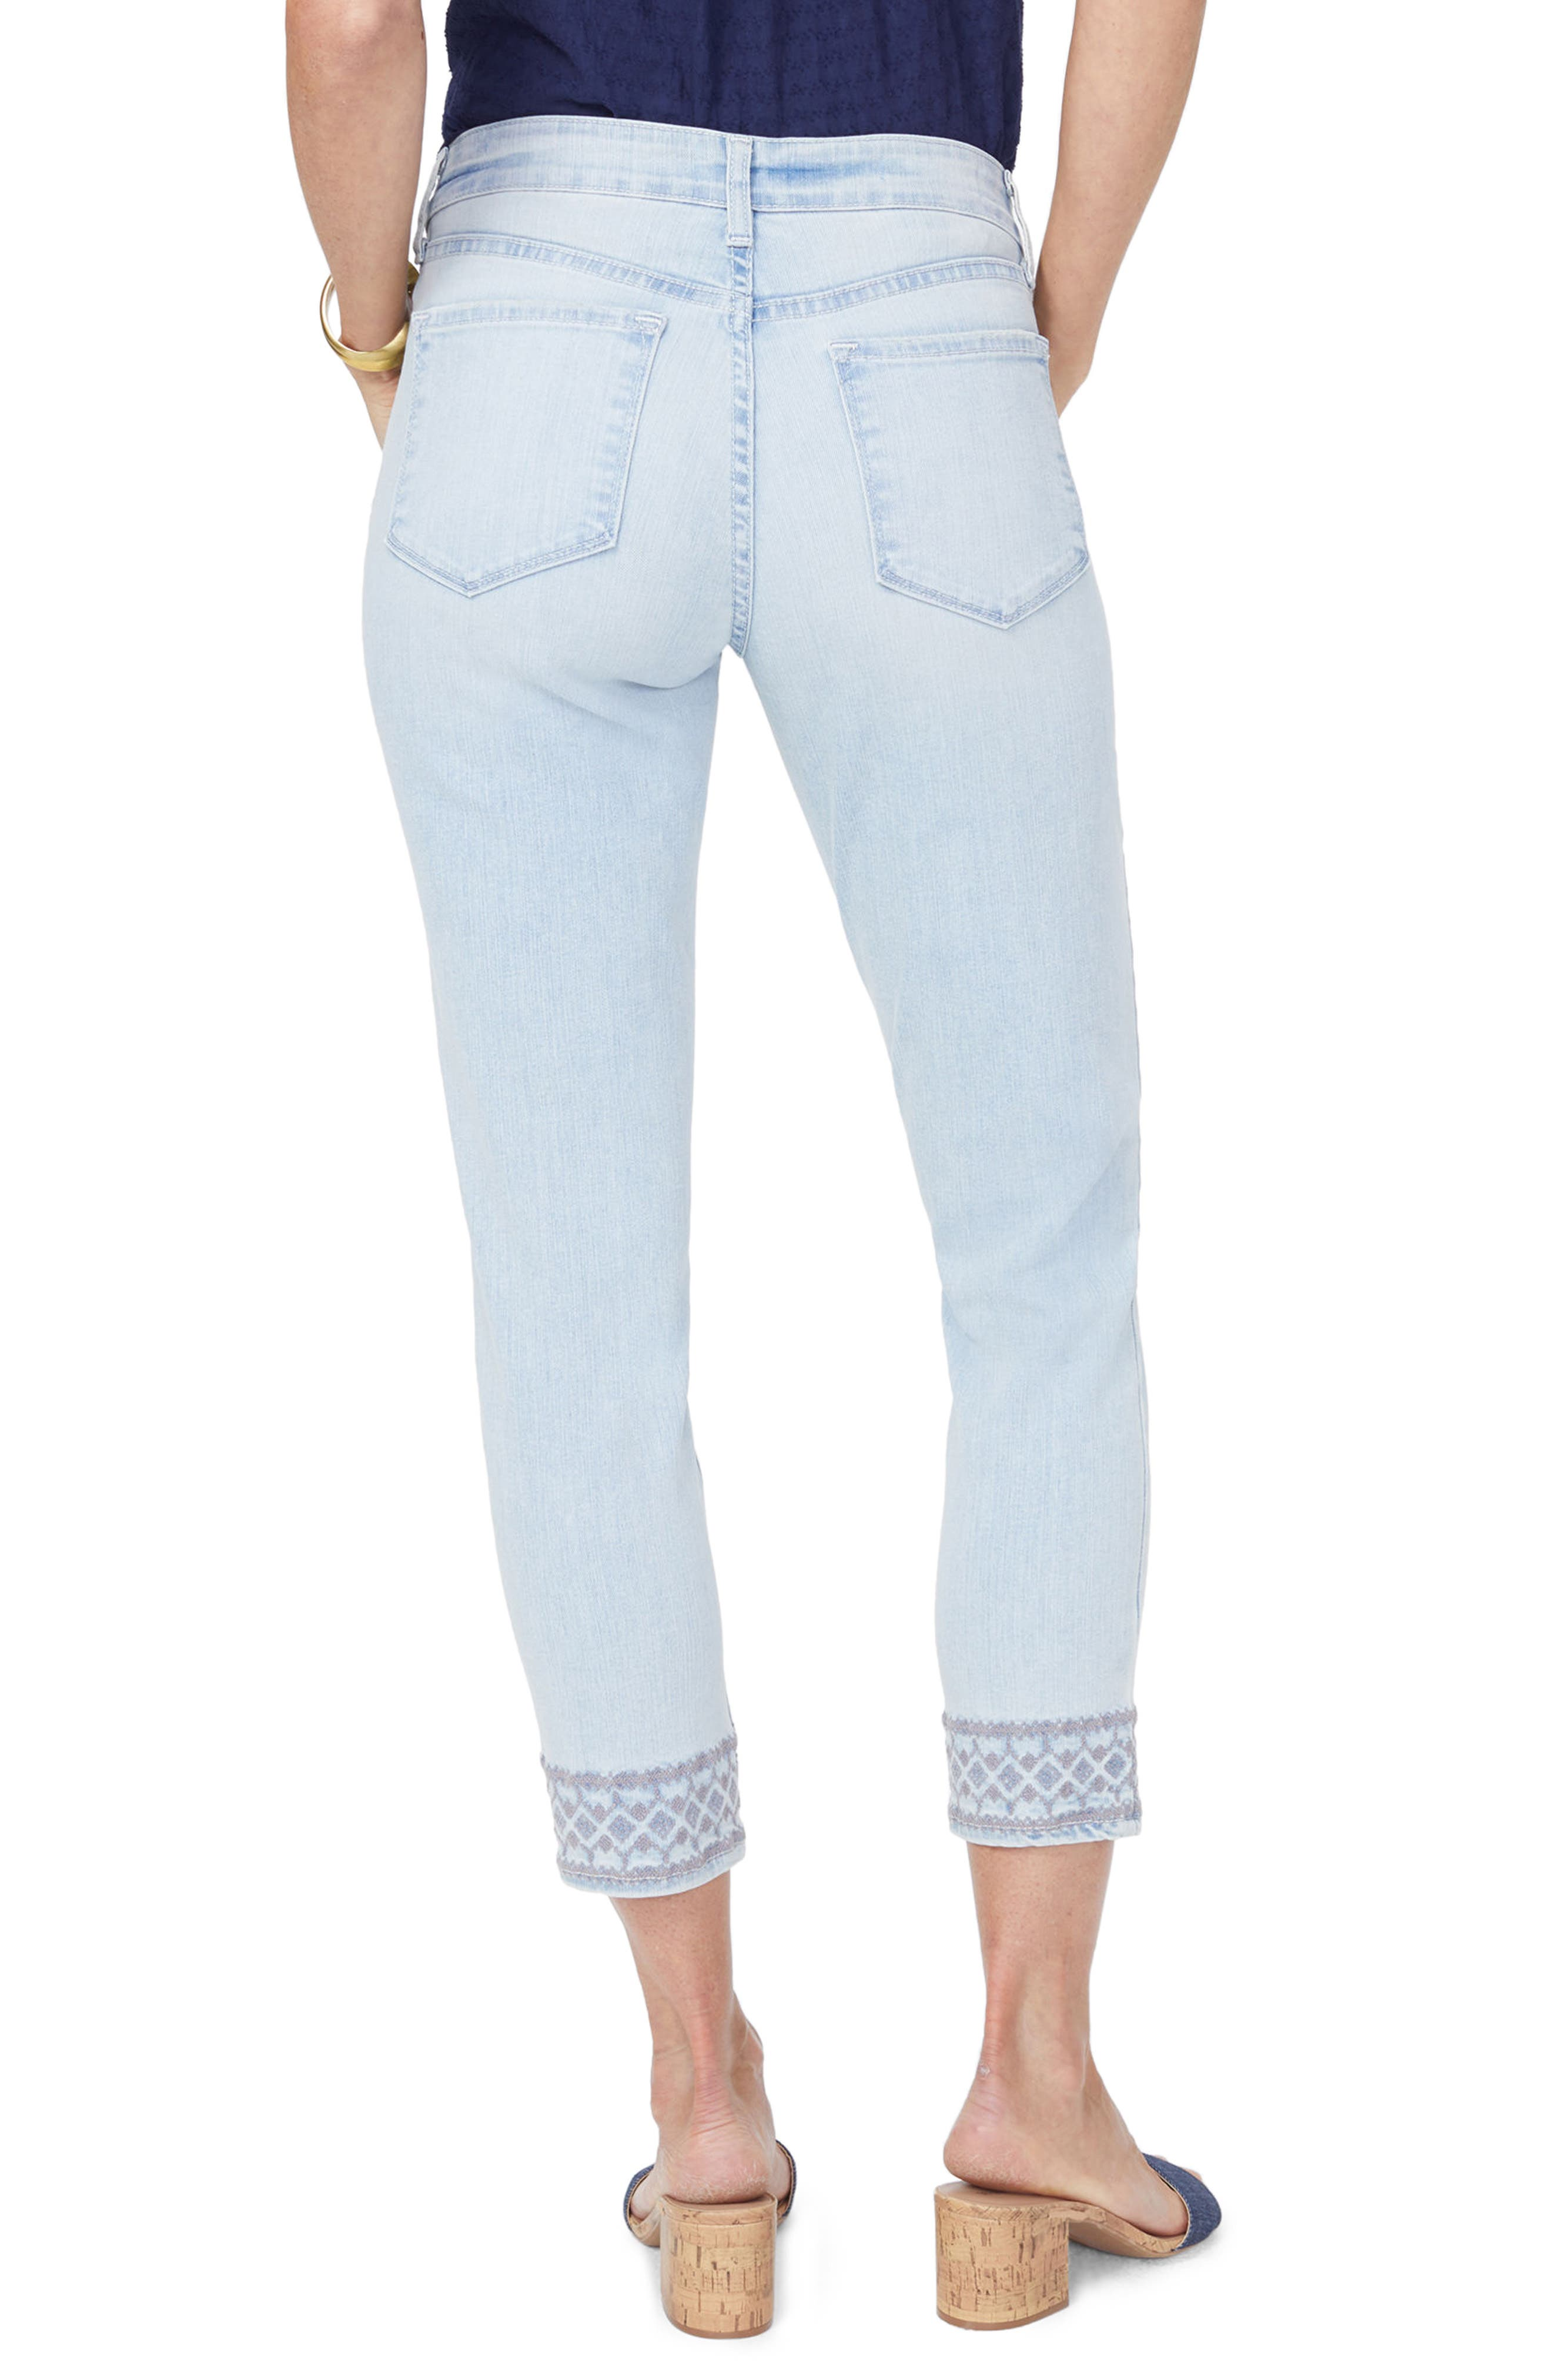 Ami Embroidered Border Ankle Skinny Jeans,                             Alternate thumbnail 2, color,                             Palm Desert